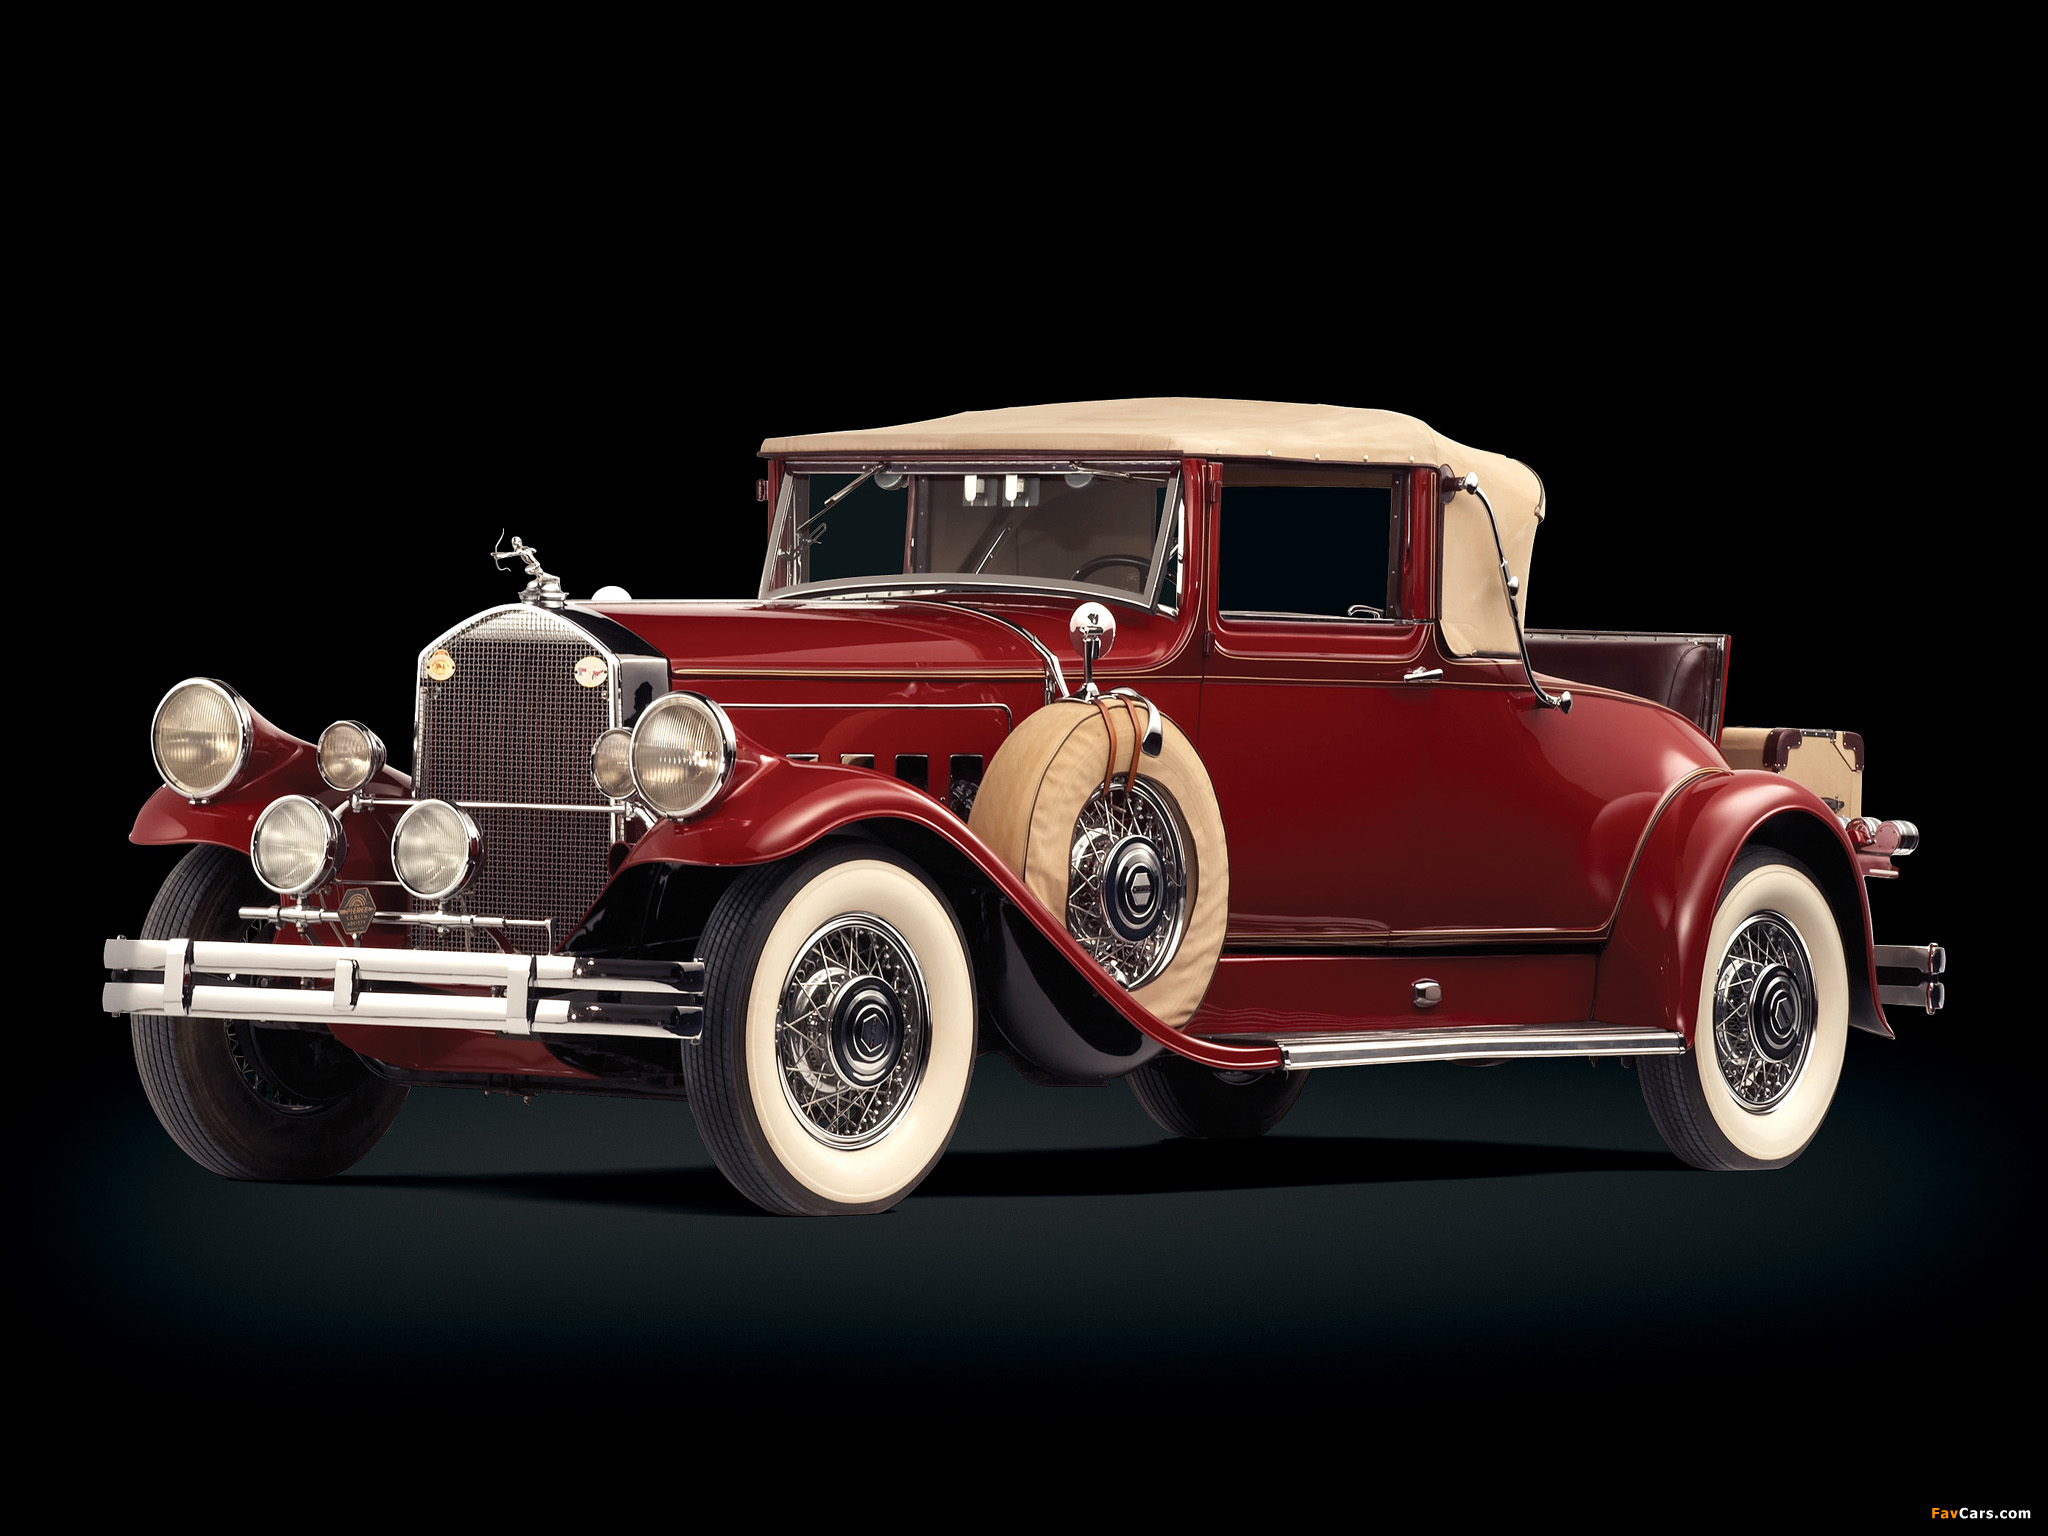 American Muscle Car Desktop Wallpapers Pierce Arrow Model A Convertible Coupe 1930 Wallpapers